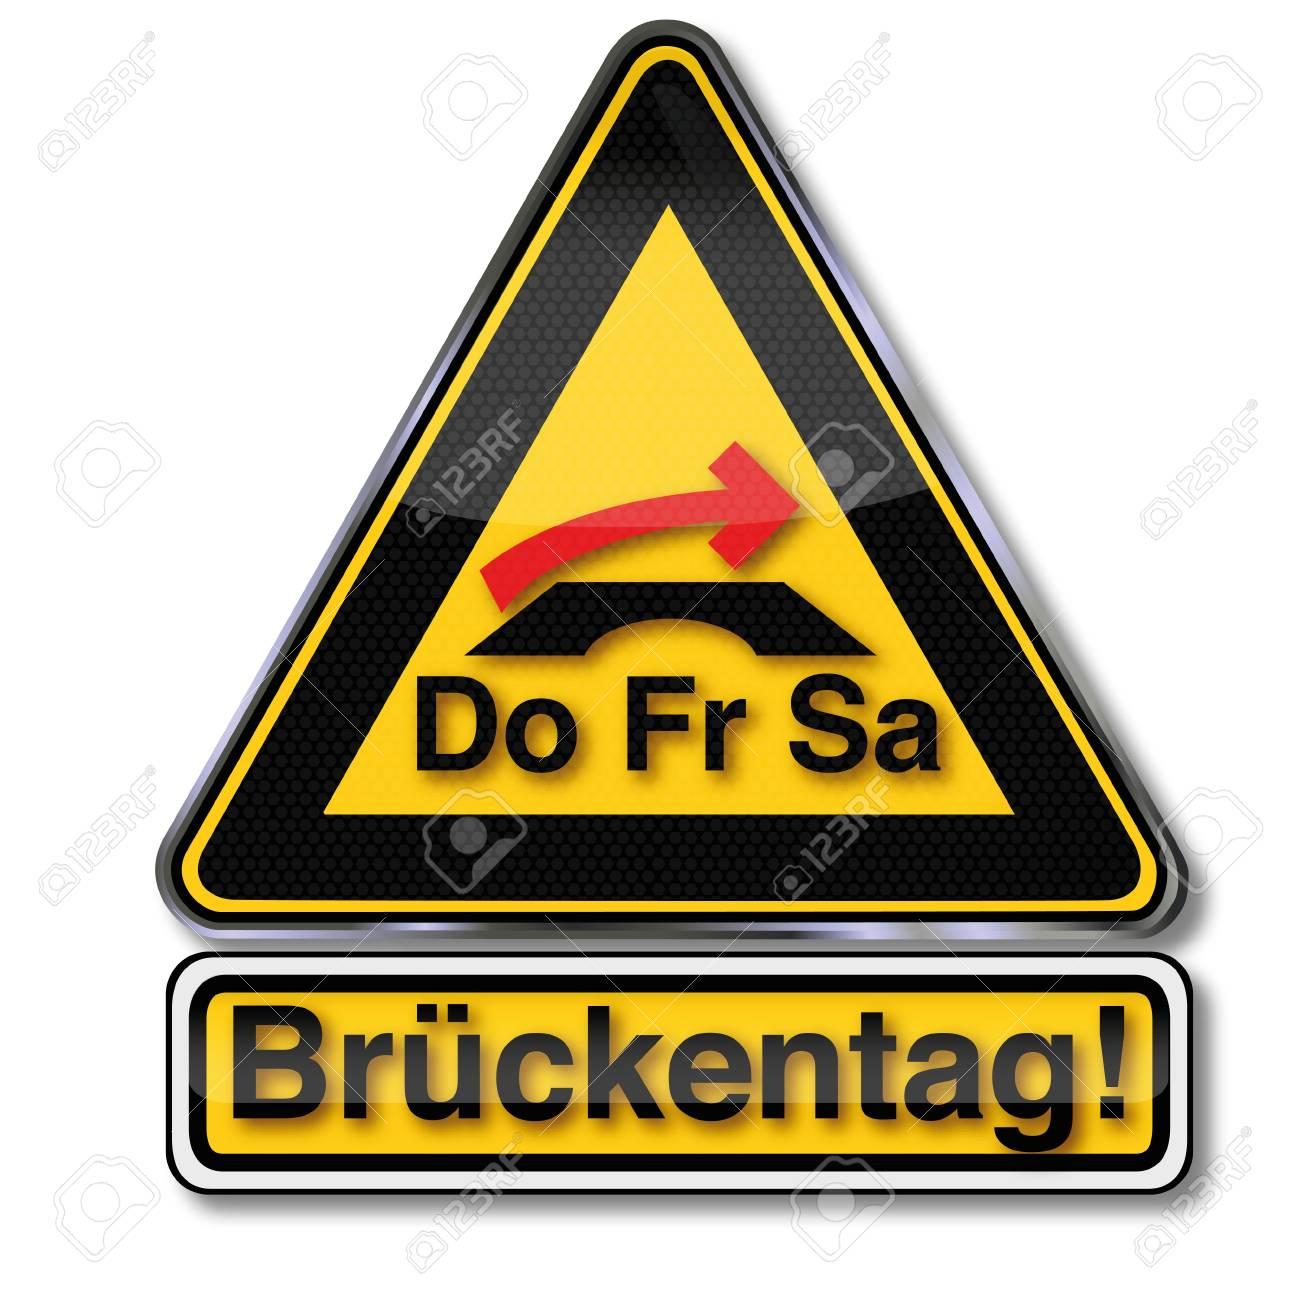 Sign bridge day Stock Vector - 17620533